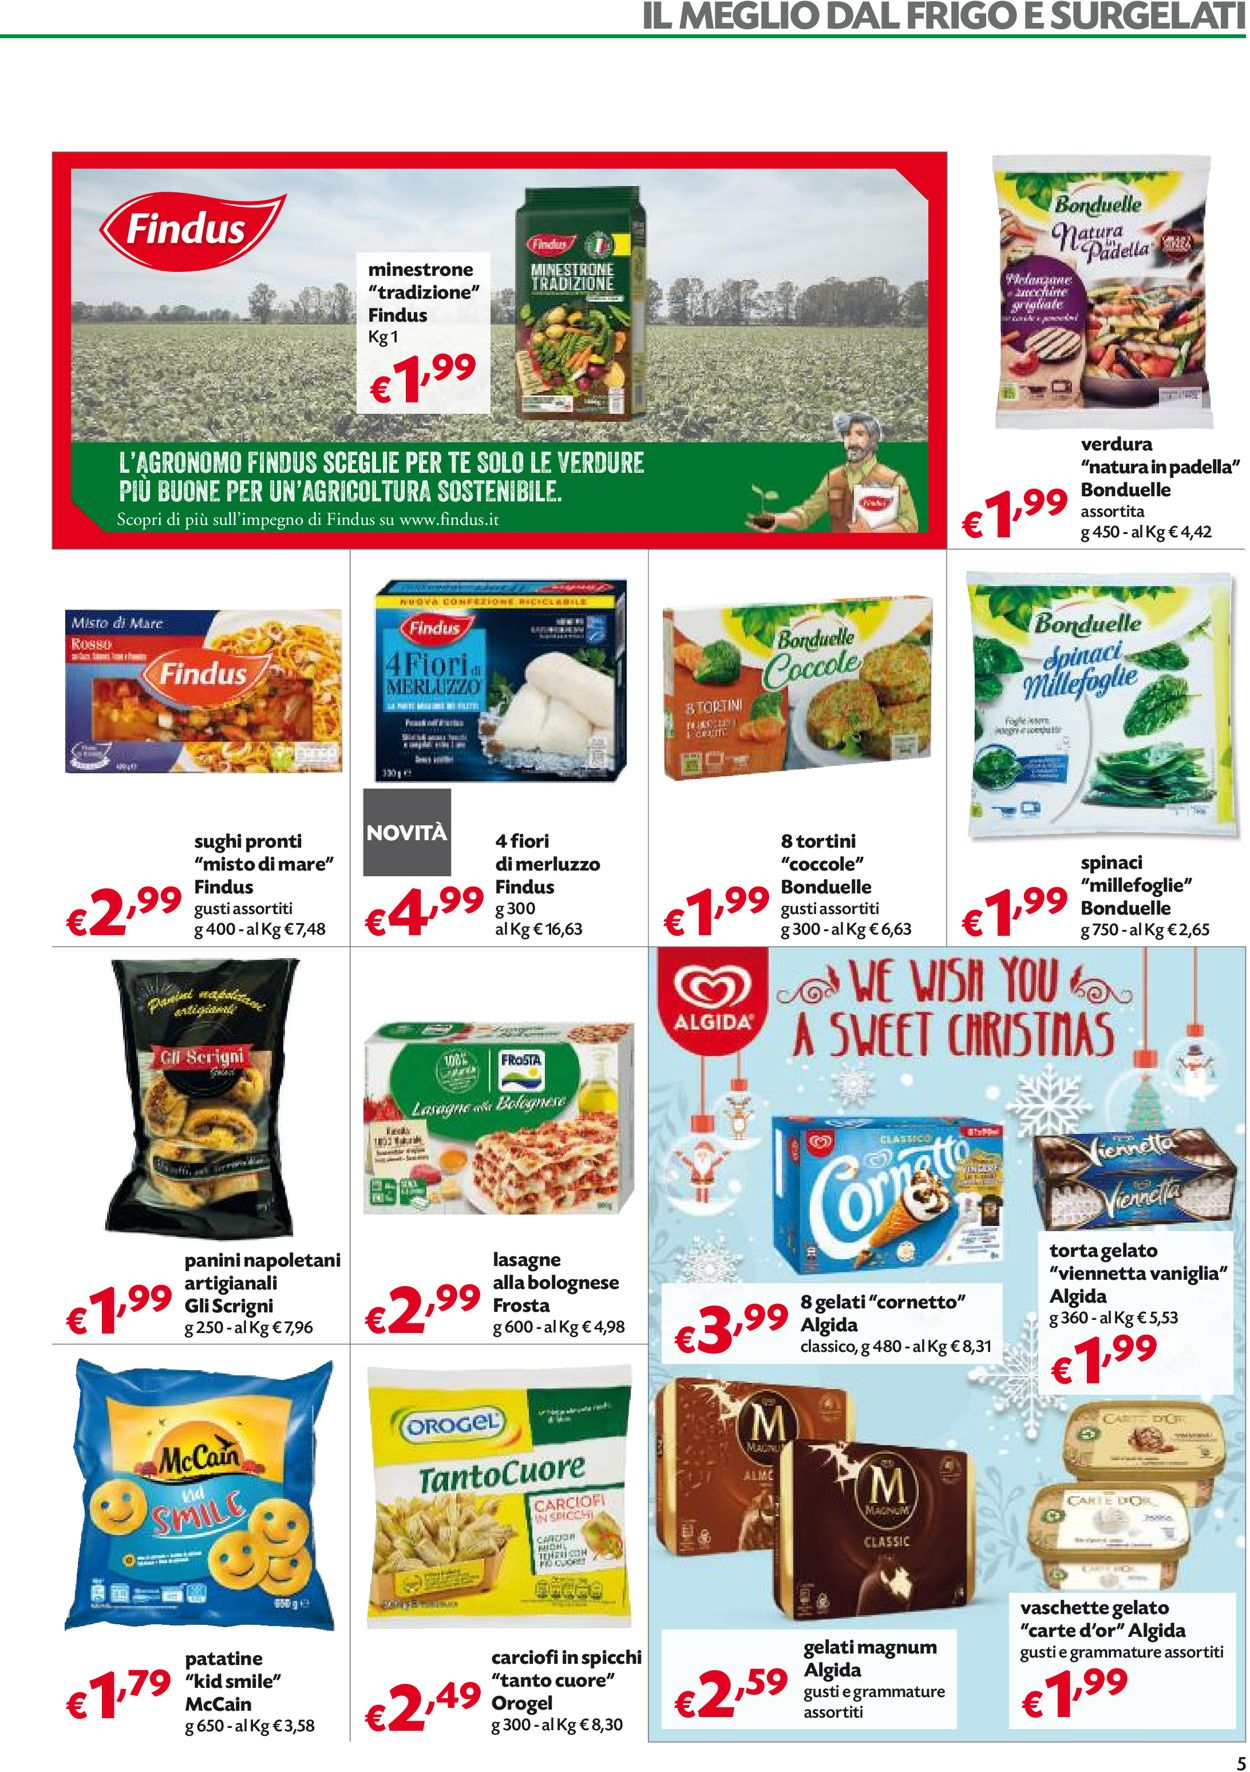 Volantino Pam Panorama - Natale 2020 - Offerte 17/12-31/12/2020 (Pagina 5)